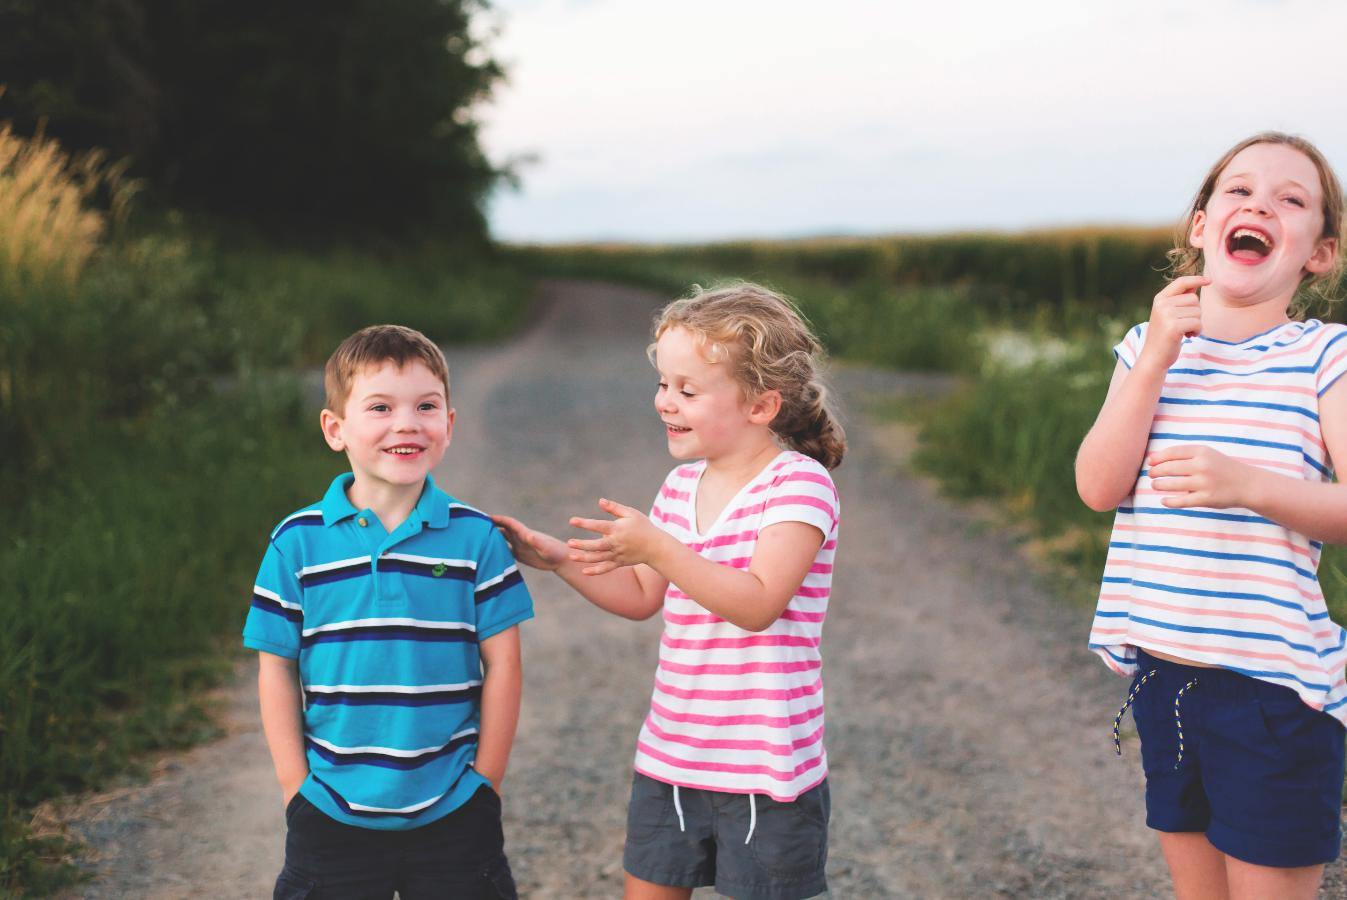 Hamilton-Toronto-Burlington-Oakville-welland-Niagara-Cambridge-Dundas-Ontario-Family-photographer-photography-Moments-by-Lauren-Nova-Scotia-Antigonish-Lifestyle-Session-Image-Photo-19.png